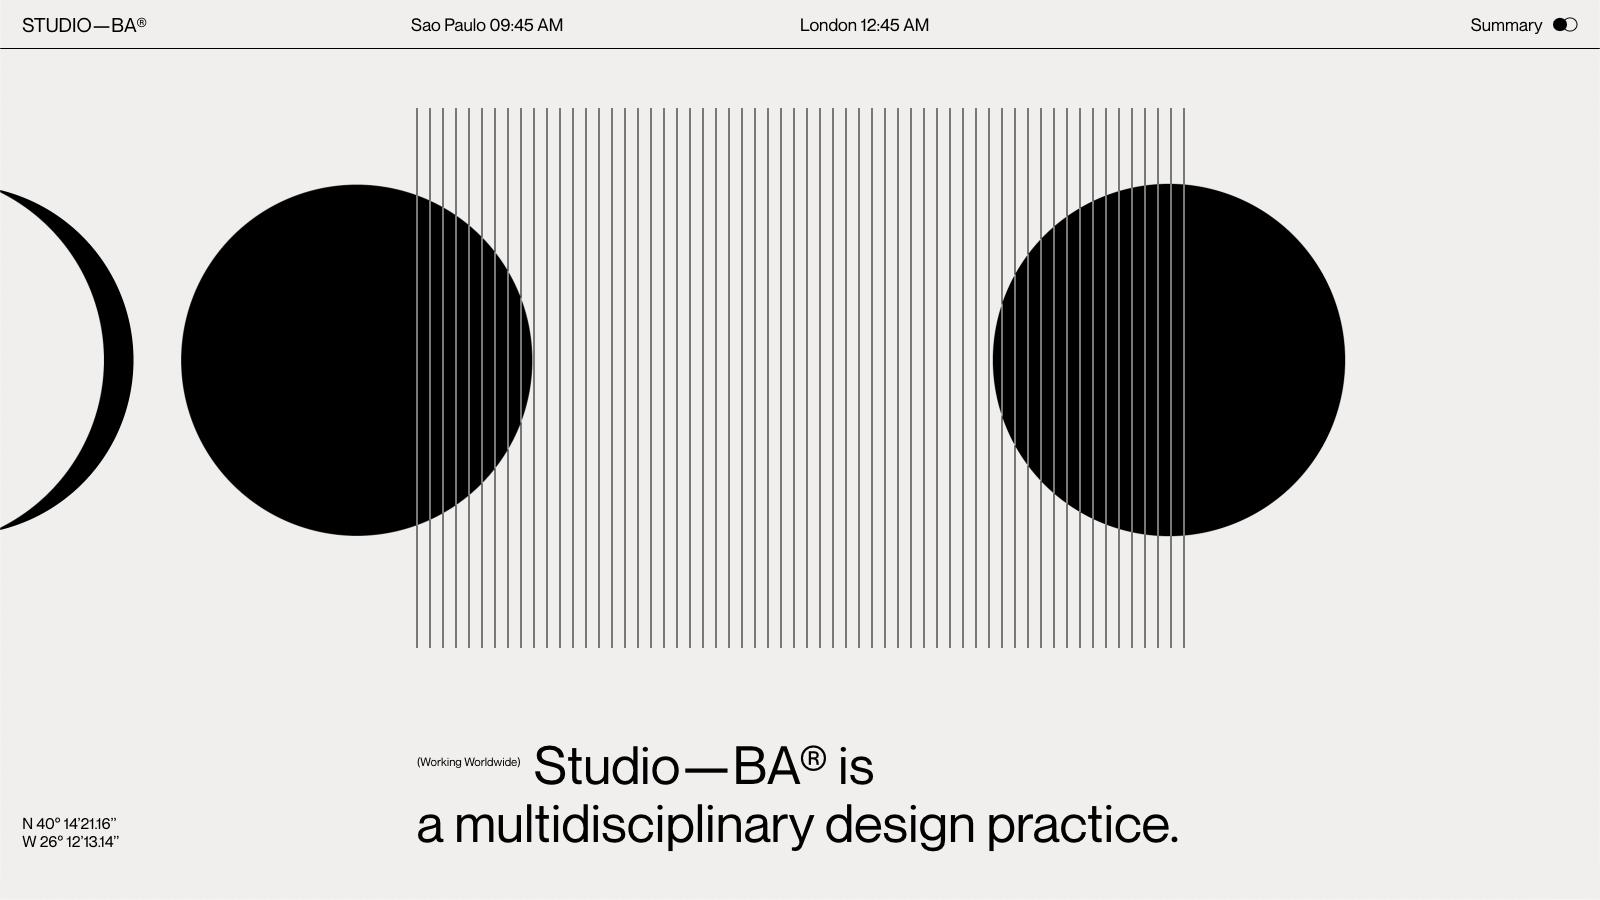 Studio—BA